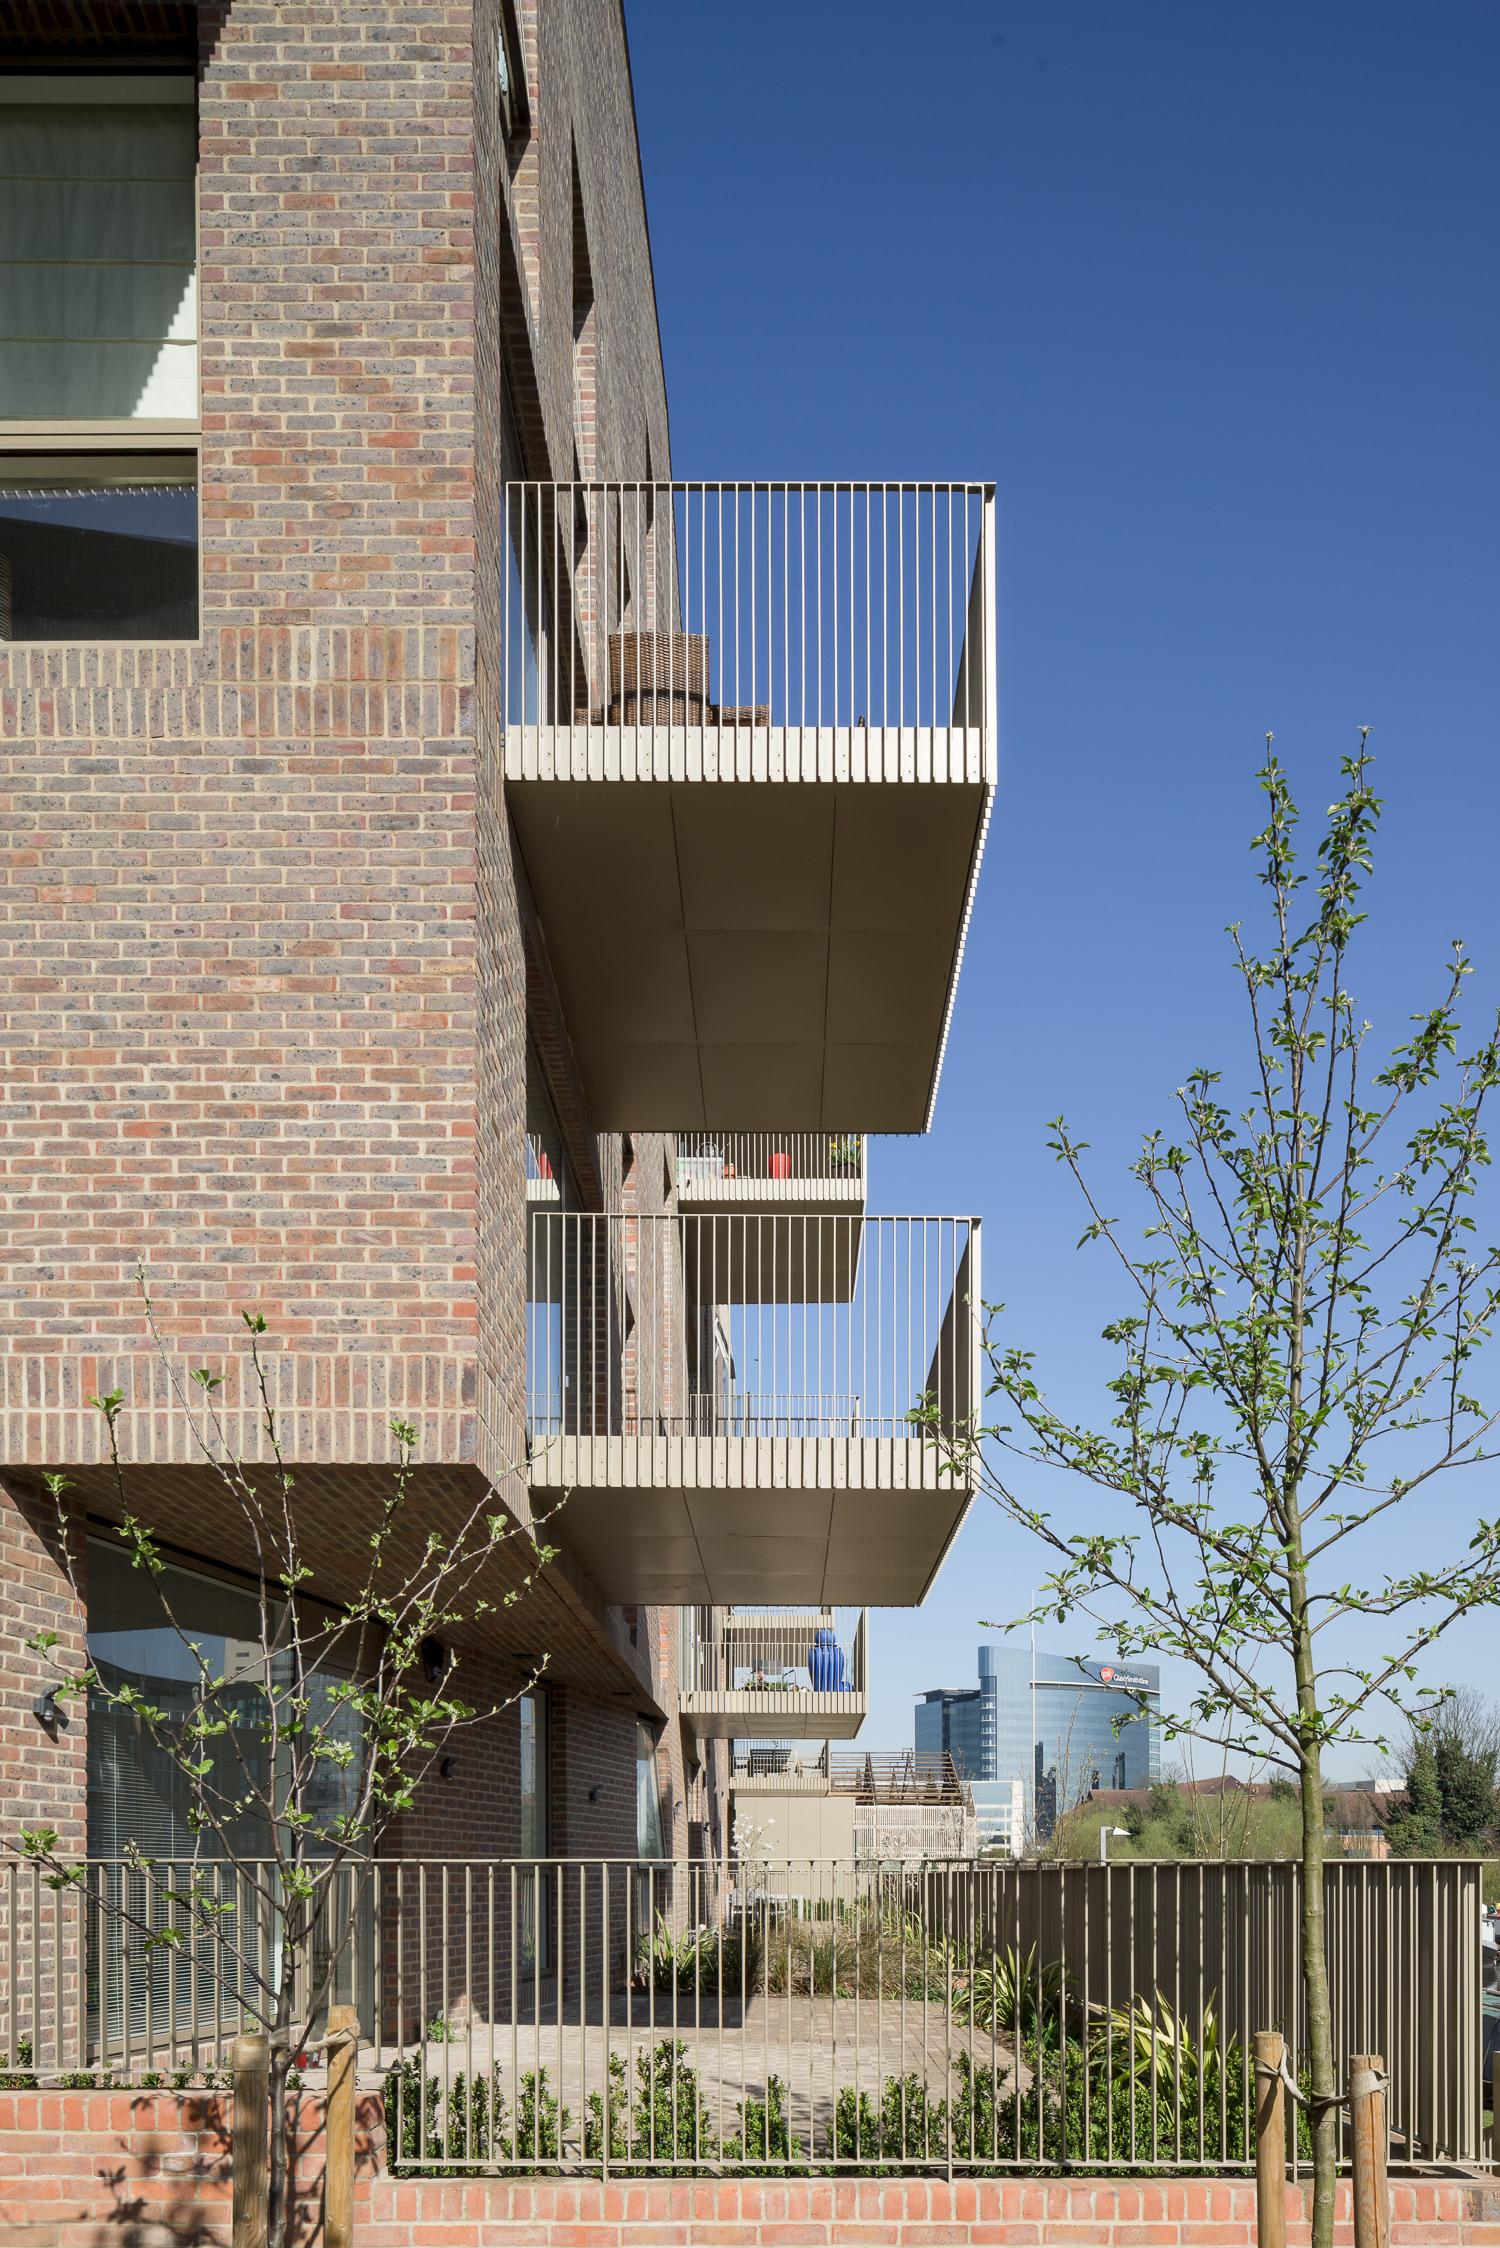 duggan-morris-brenrtford-lock-mark-hadden-amsterdam-architecture-photographer-architectuurfotograaf-038.jpg